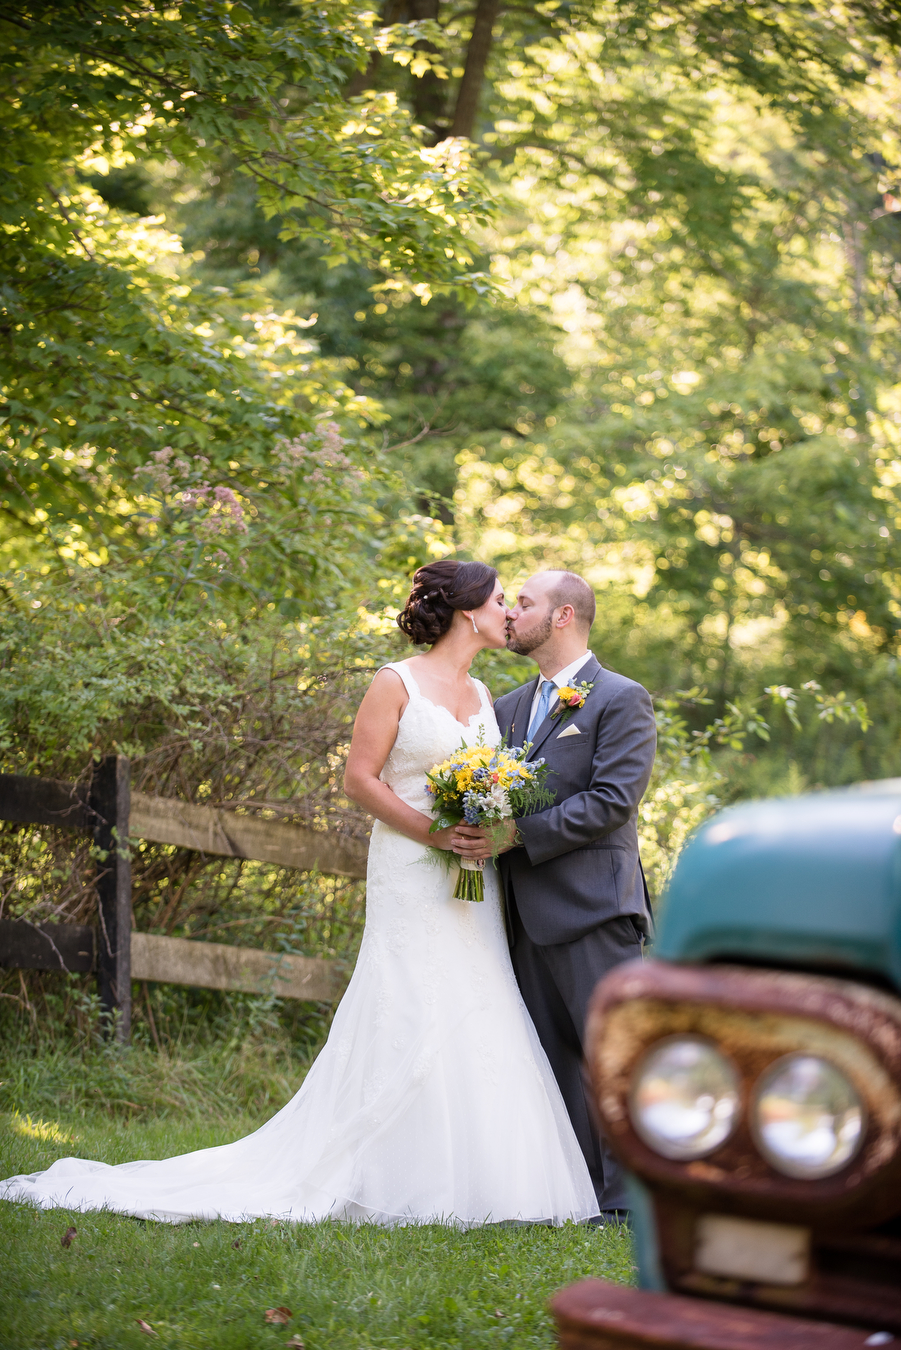 Karlo Gesner Photography Chanteclaire Farm Deep Creek Lake Lancaster Philadelphia Wedding Photographer 0017.JPG